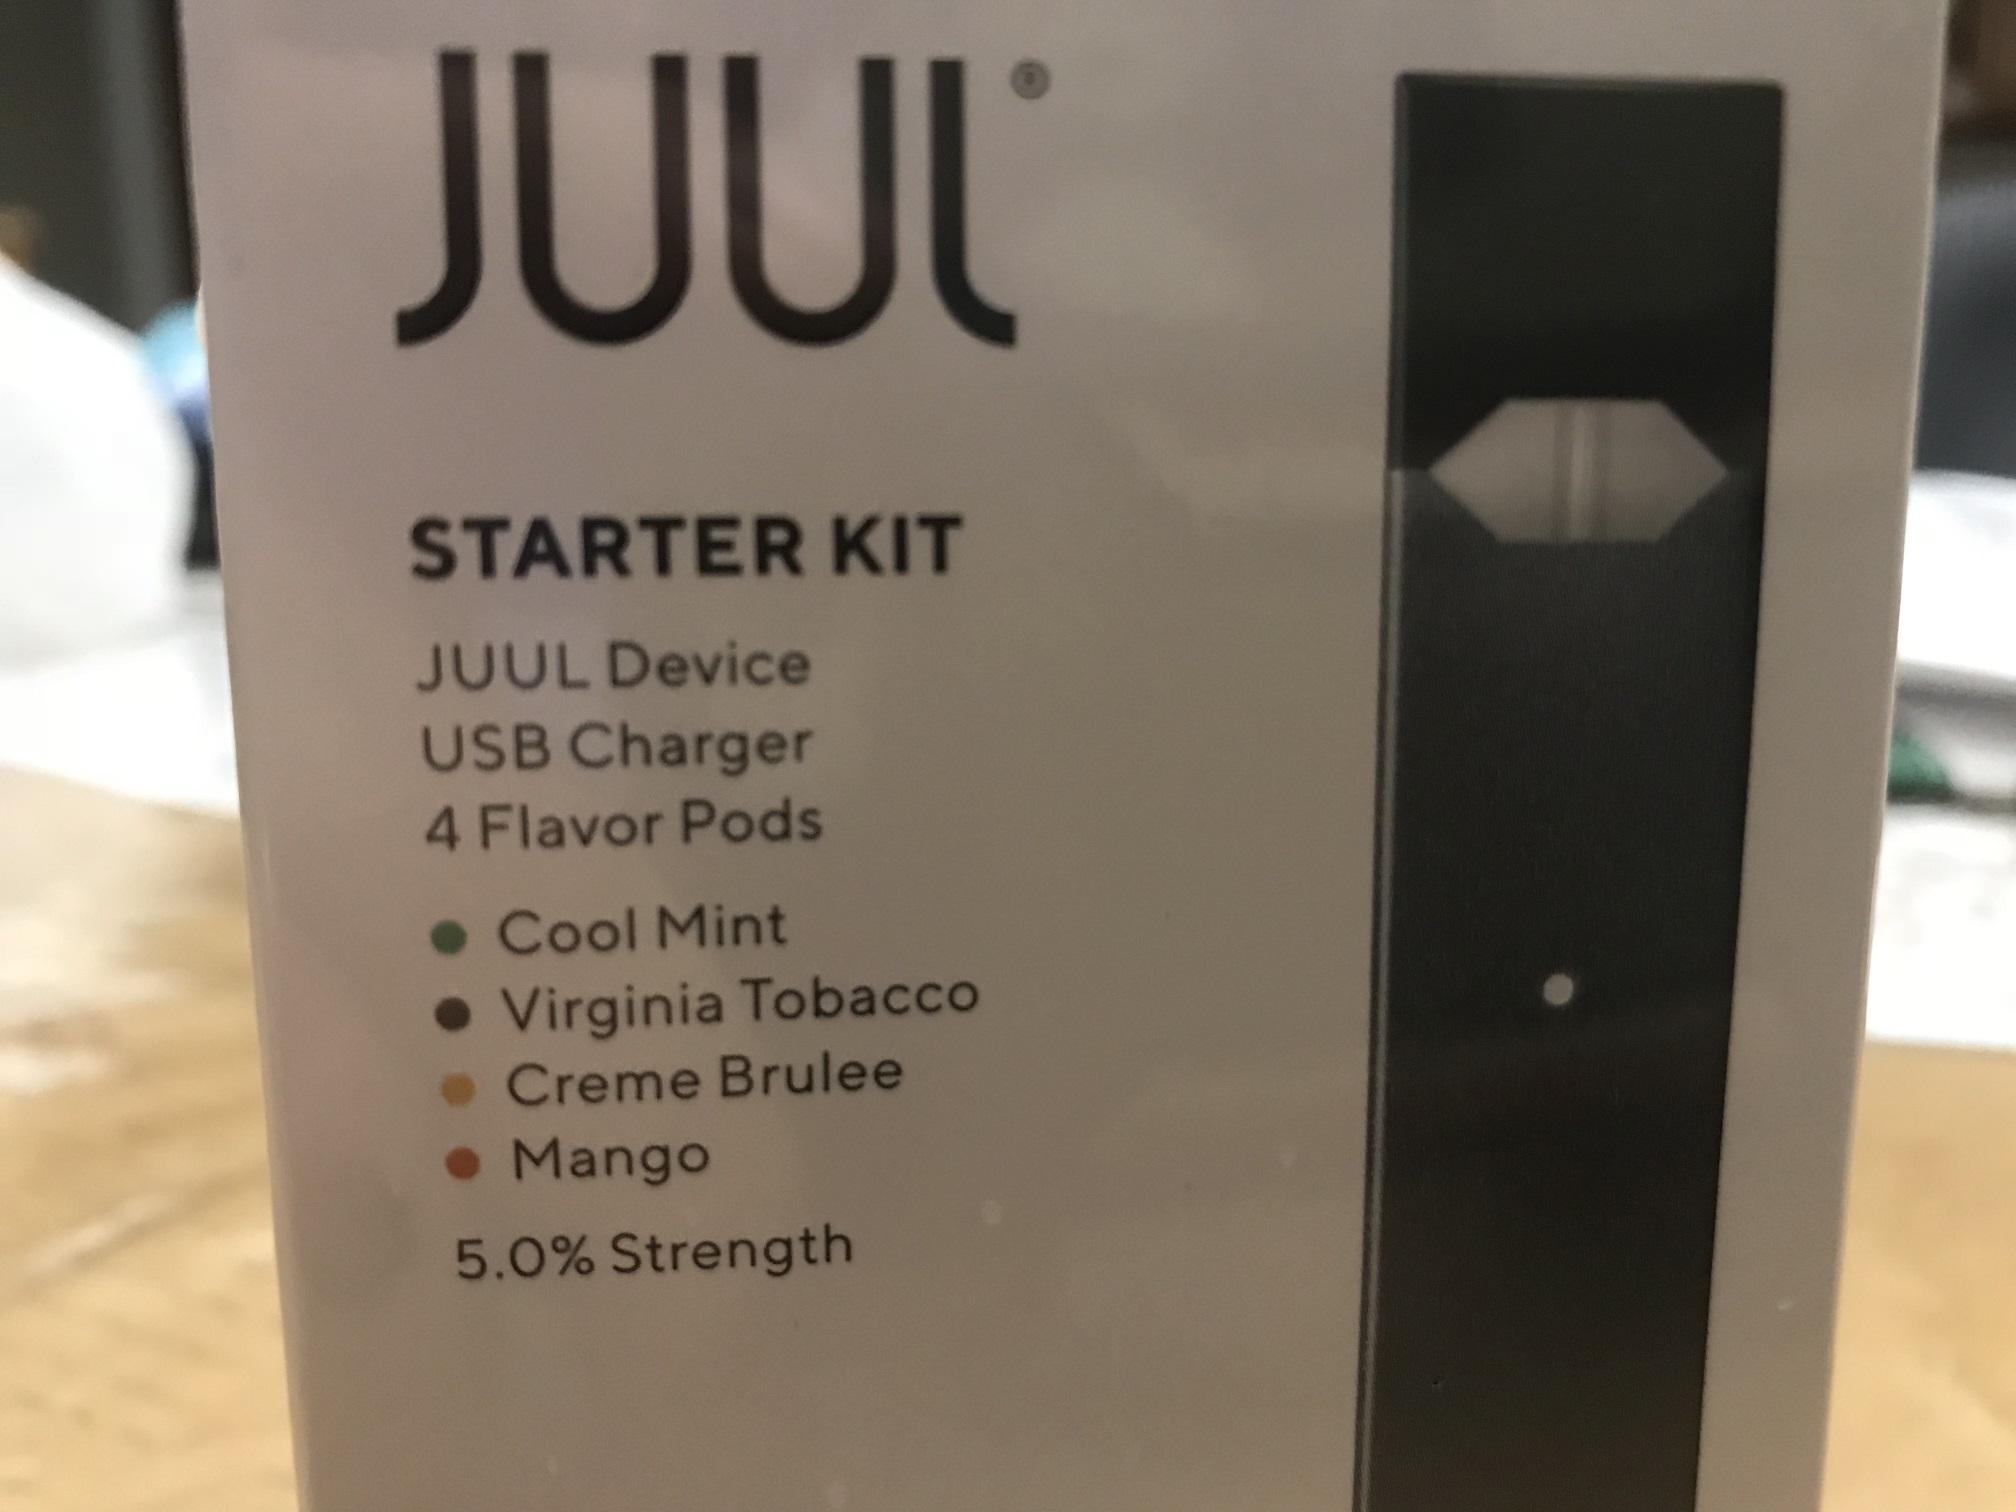 JUUL Starter Kit ( JUUL Device - USB Charger - 4 Flavor Pods )